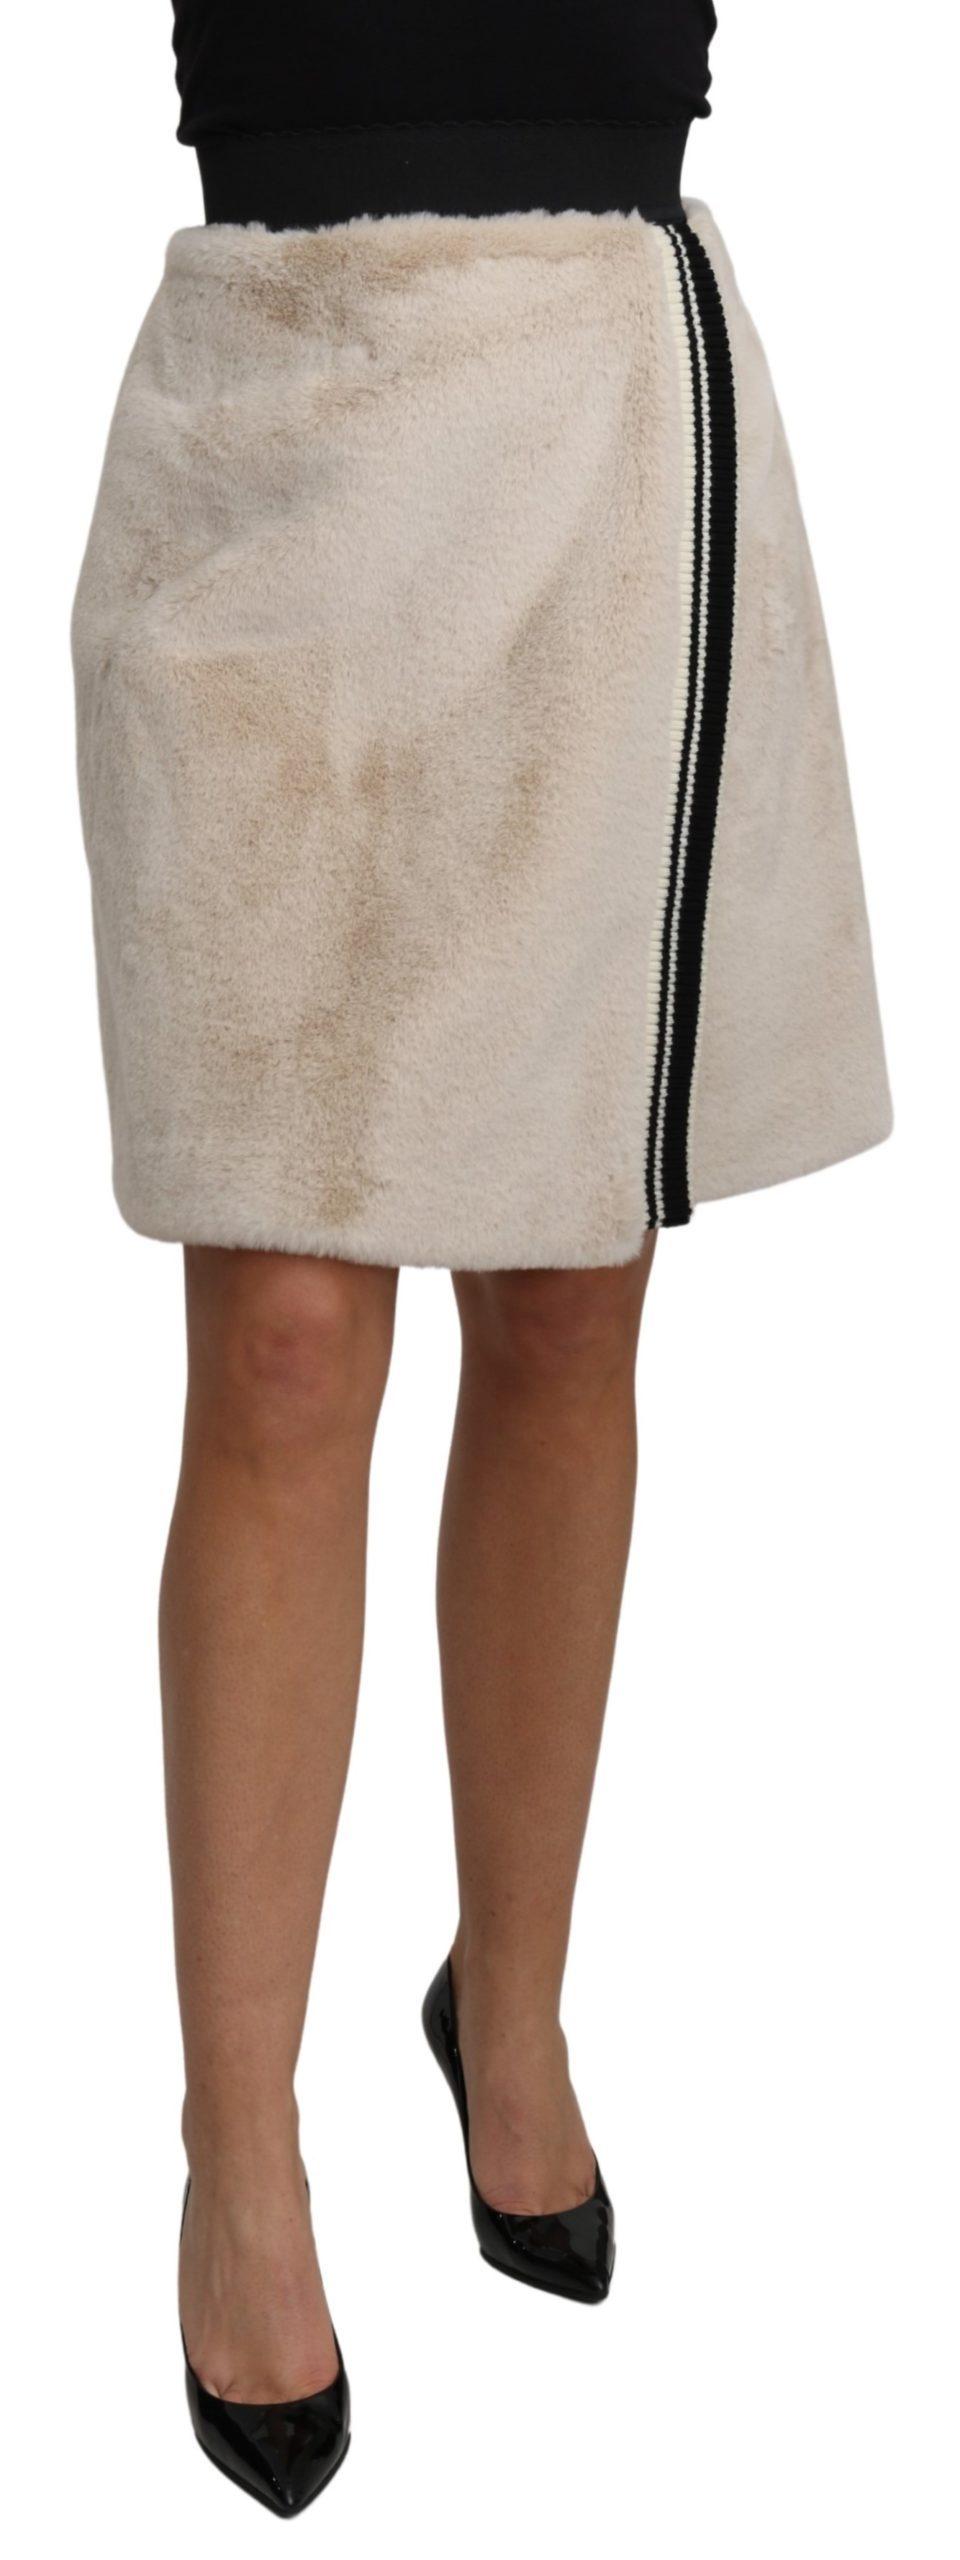 Dolce & Gabbana Women's High Waist A-line Mini Fur Skirt Beige SKI1475 - IT40|S